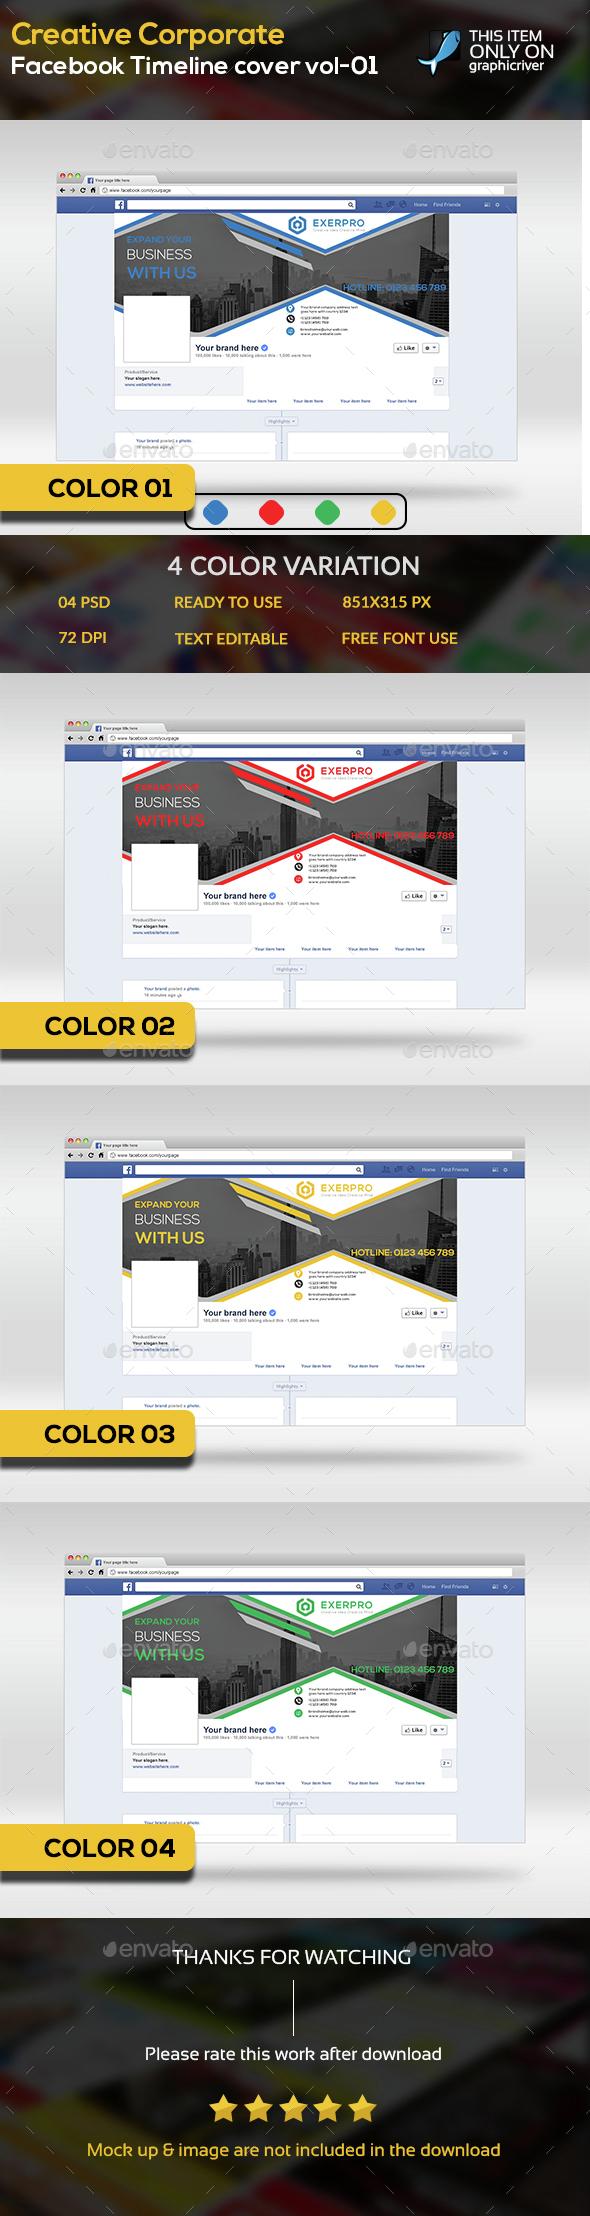 Creative Corporate Facebook timeline cover vol-01 - Facebook Timeline Covers Social Media